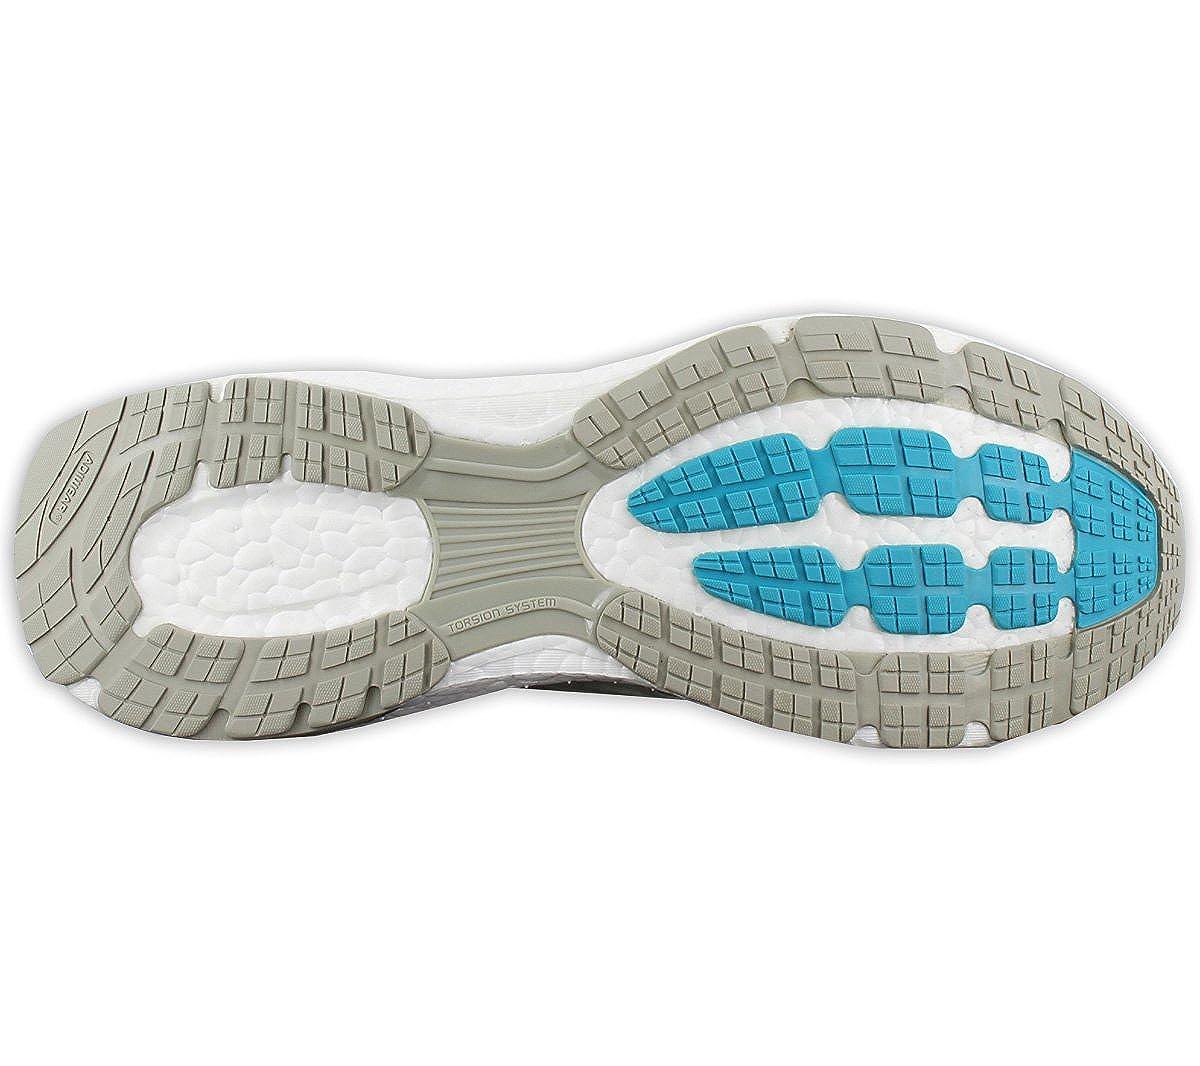 adidas Consortium Energy Boost Sneaker Packer x Solebox